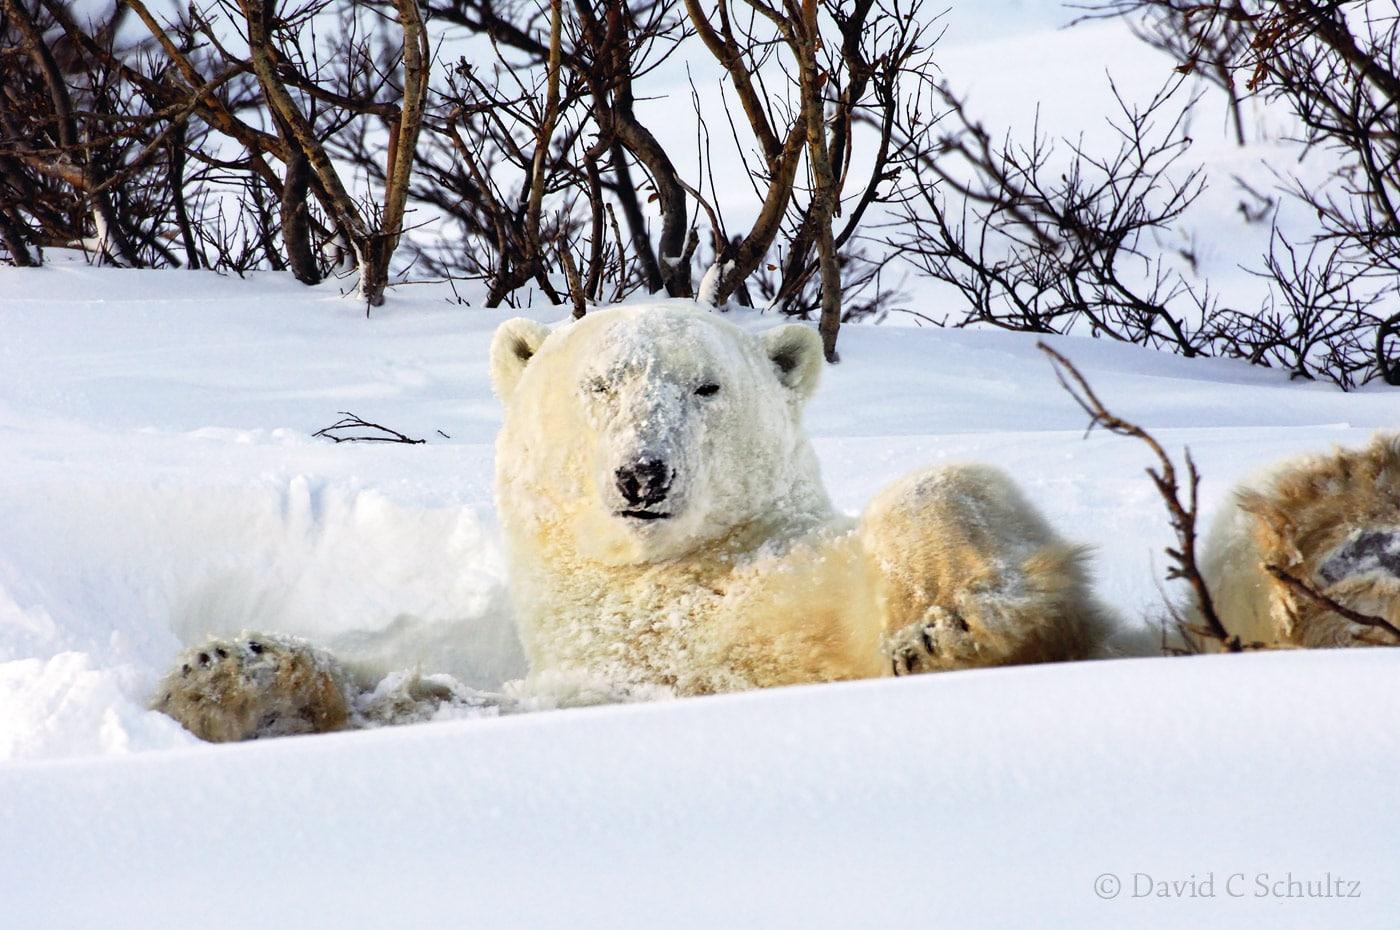 Polar bear, Canada - Image #168-502